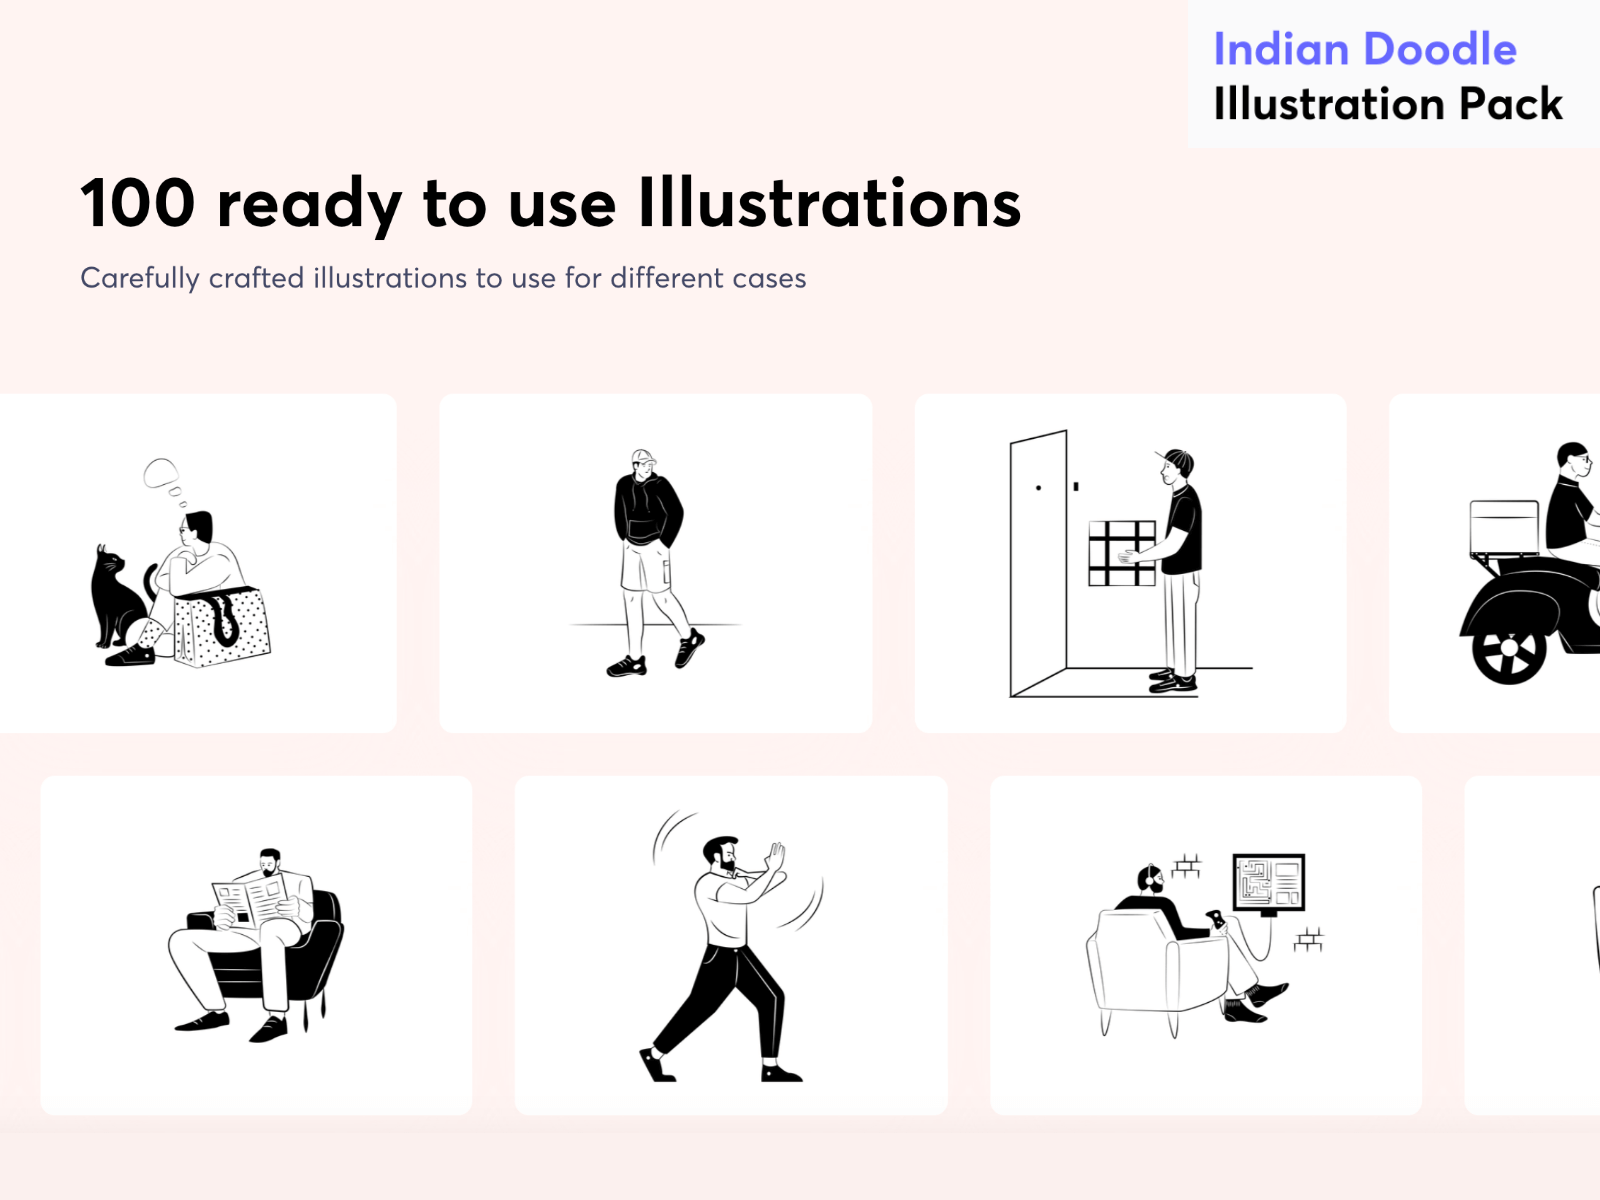 Indian Doodle Illustration pack cover image